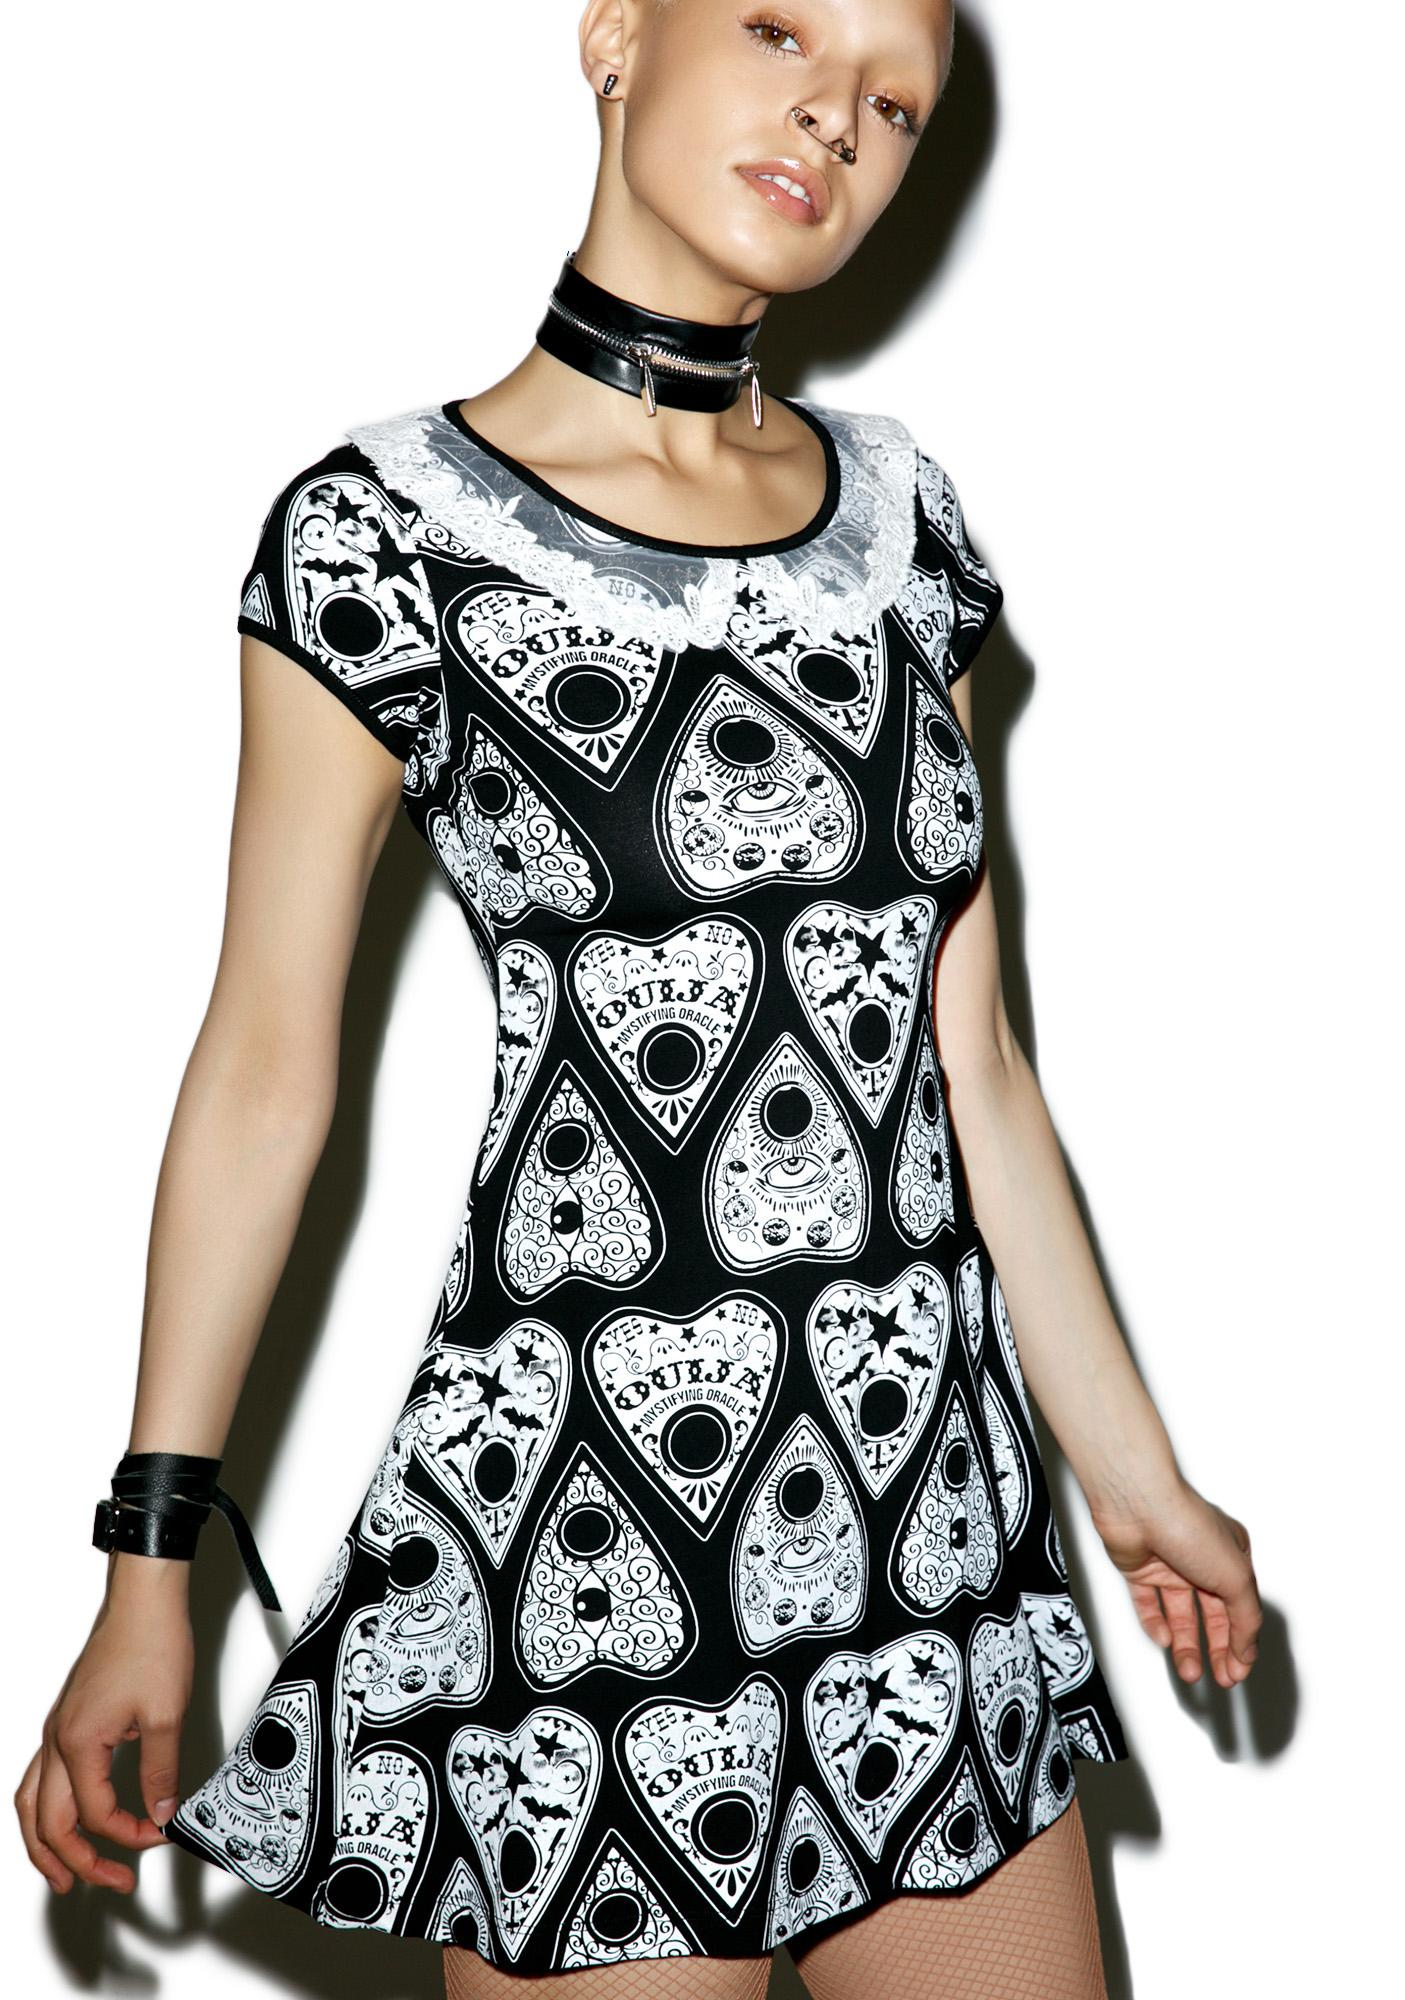 Demonic Games Dress